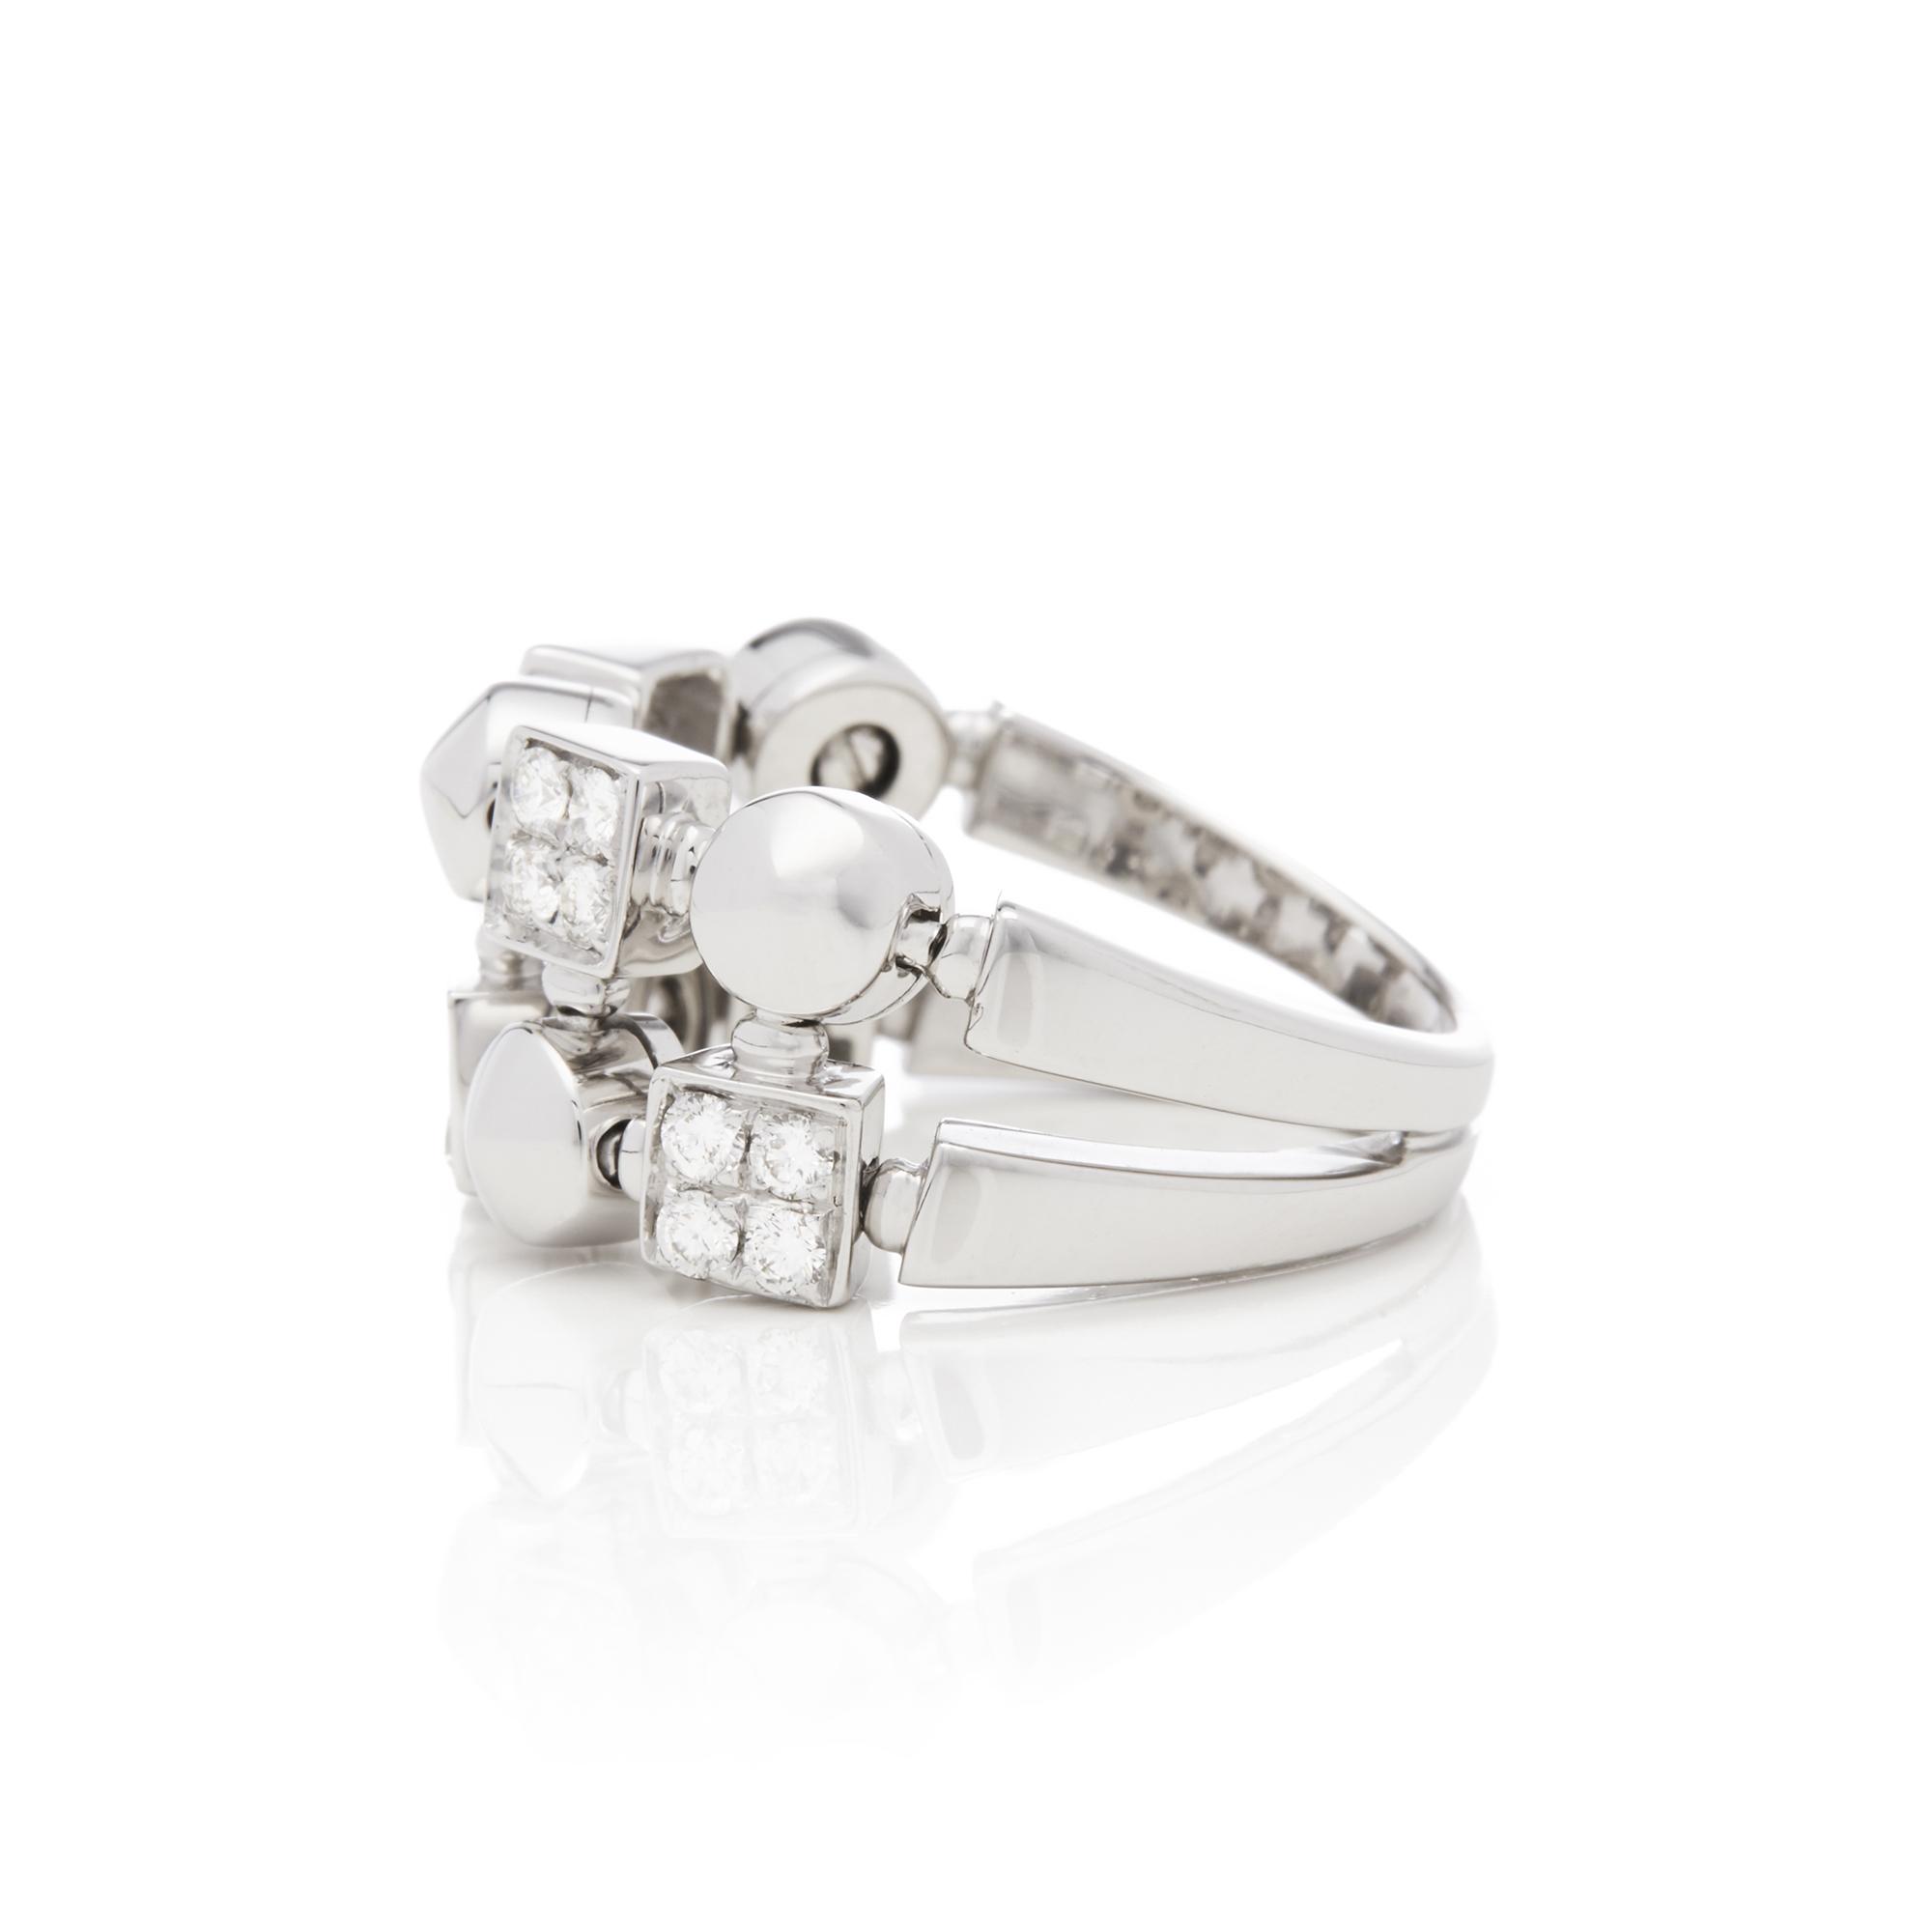 Bulgari 18ct White Gold Lucéa Diamond Ring - Image 5 of 7